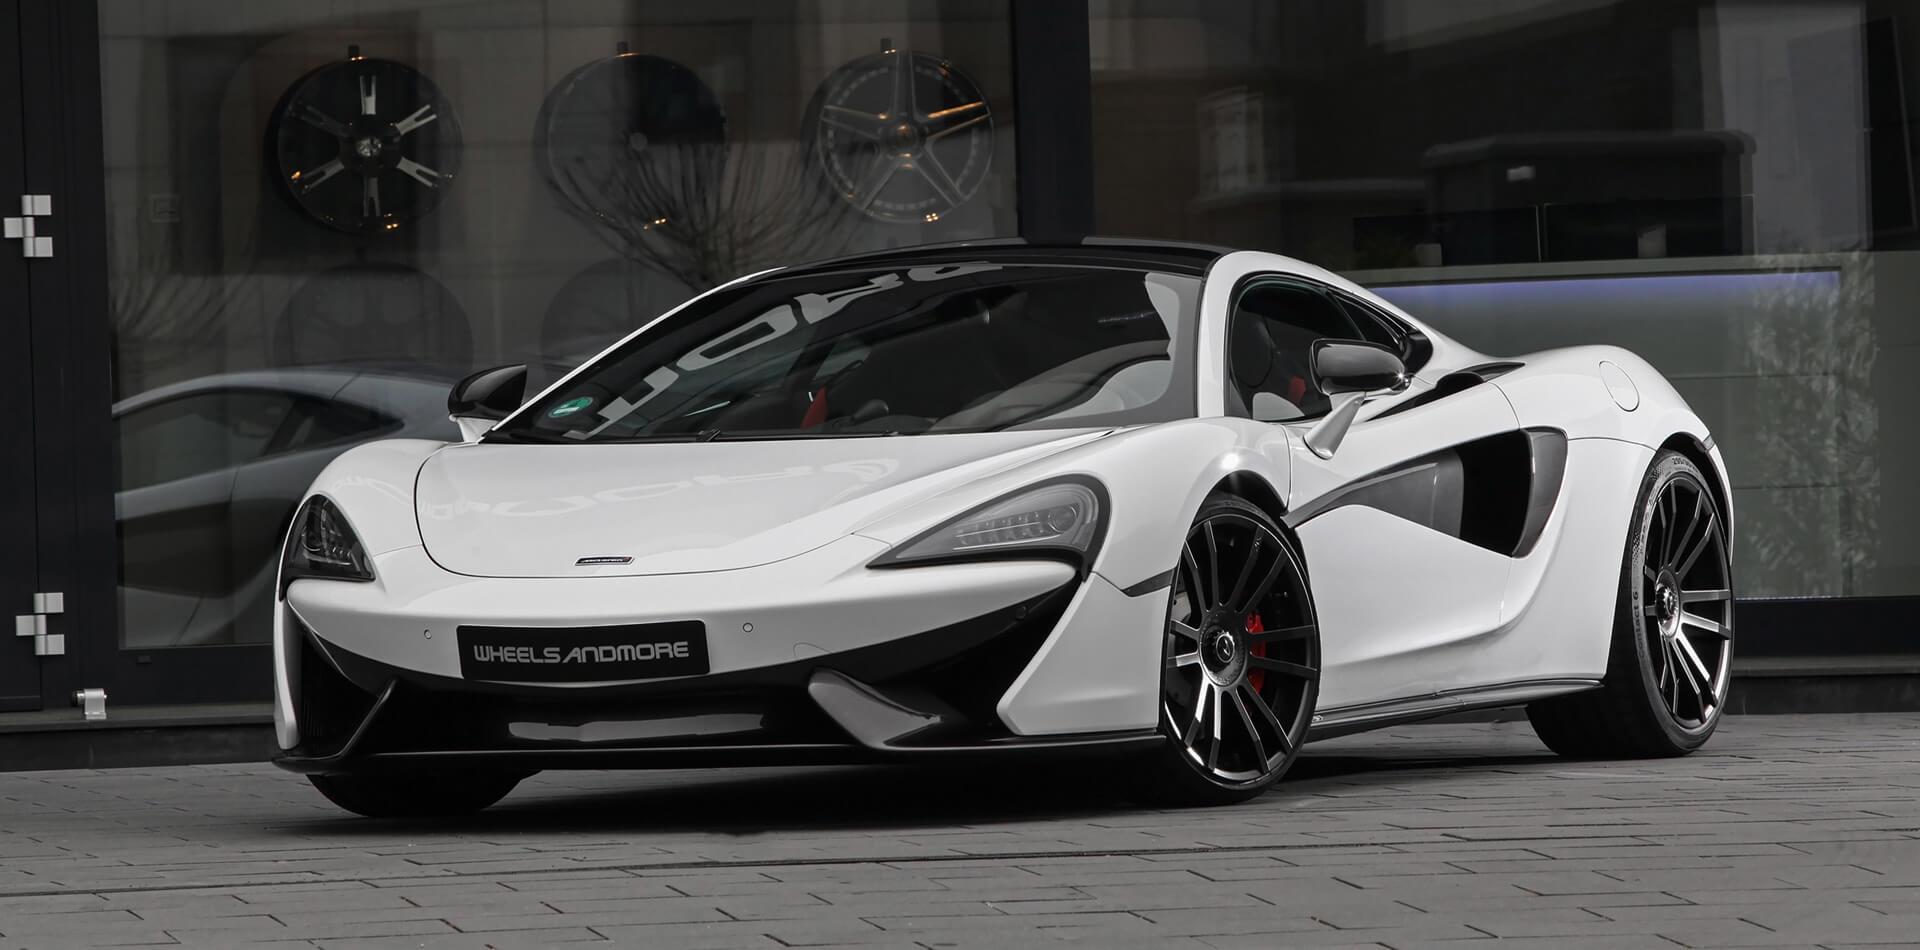 McLaren 570GT by Wheelsandmore